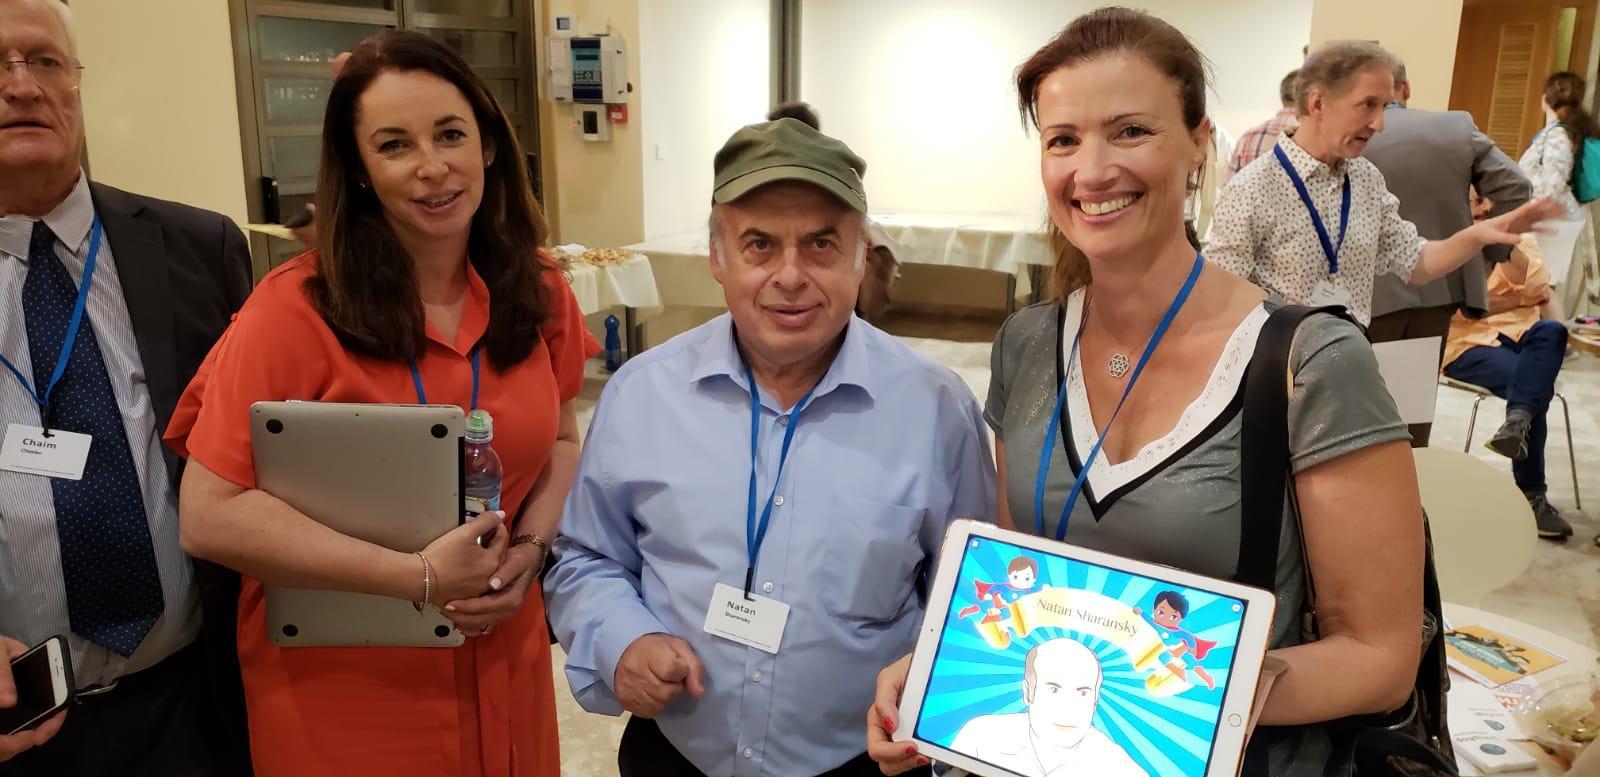 Natan Sharansky Superman of Israel Game